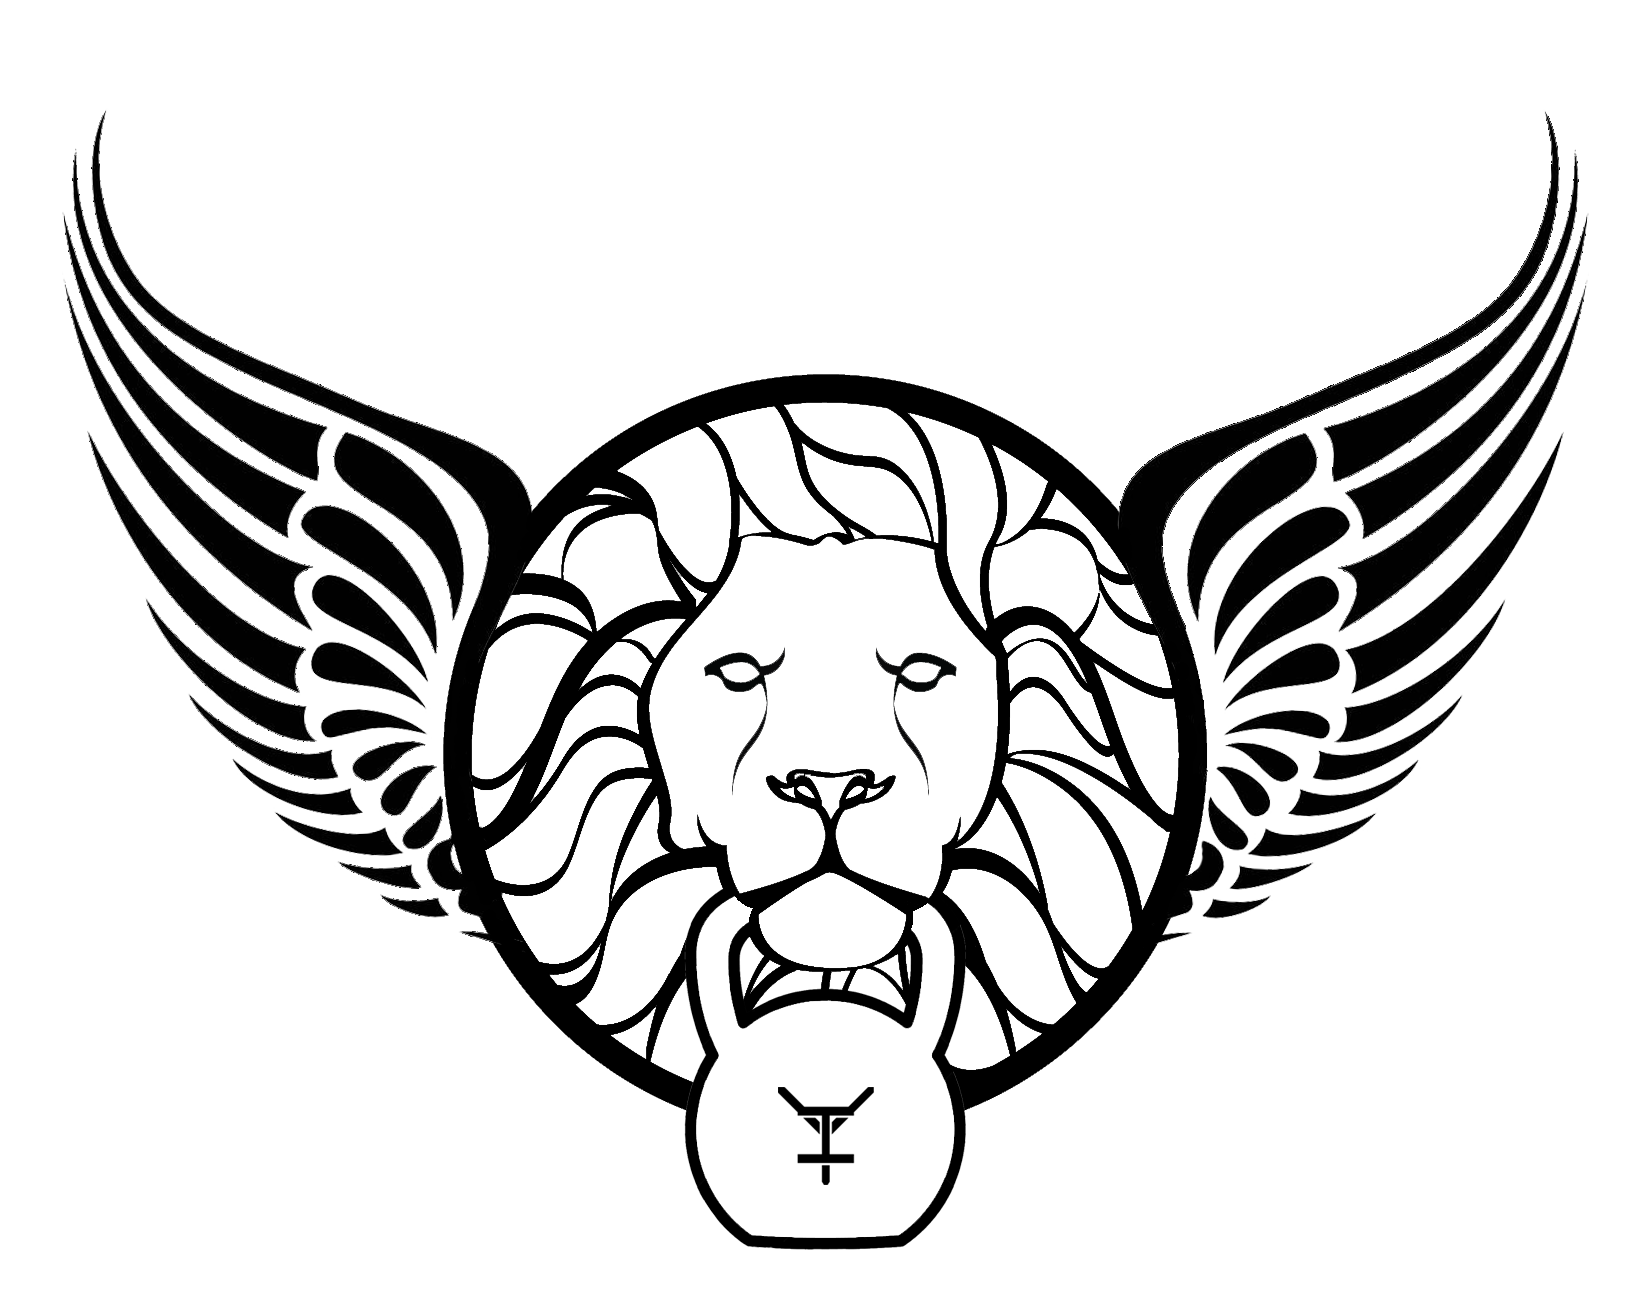 lion logo yubari clear.png